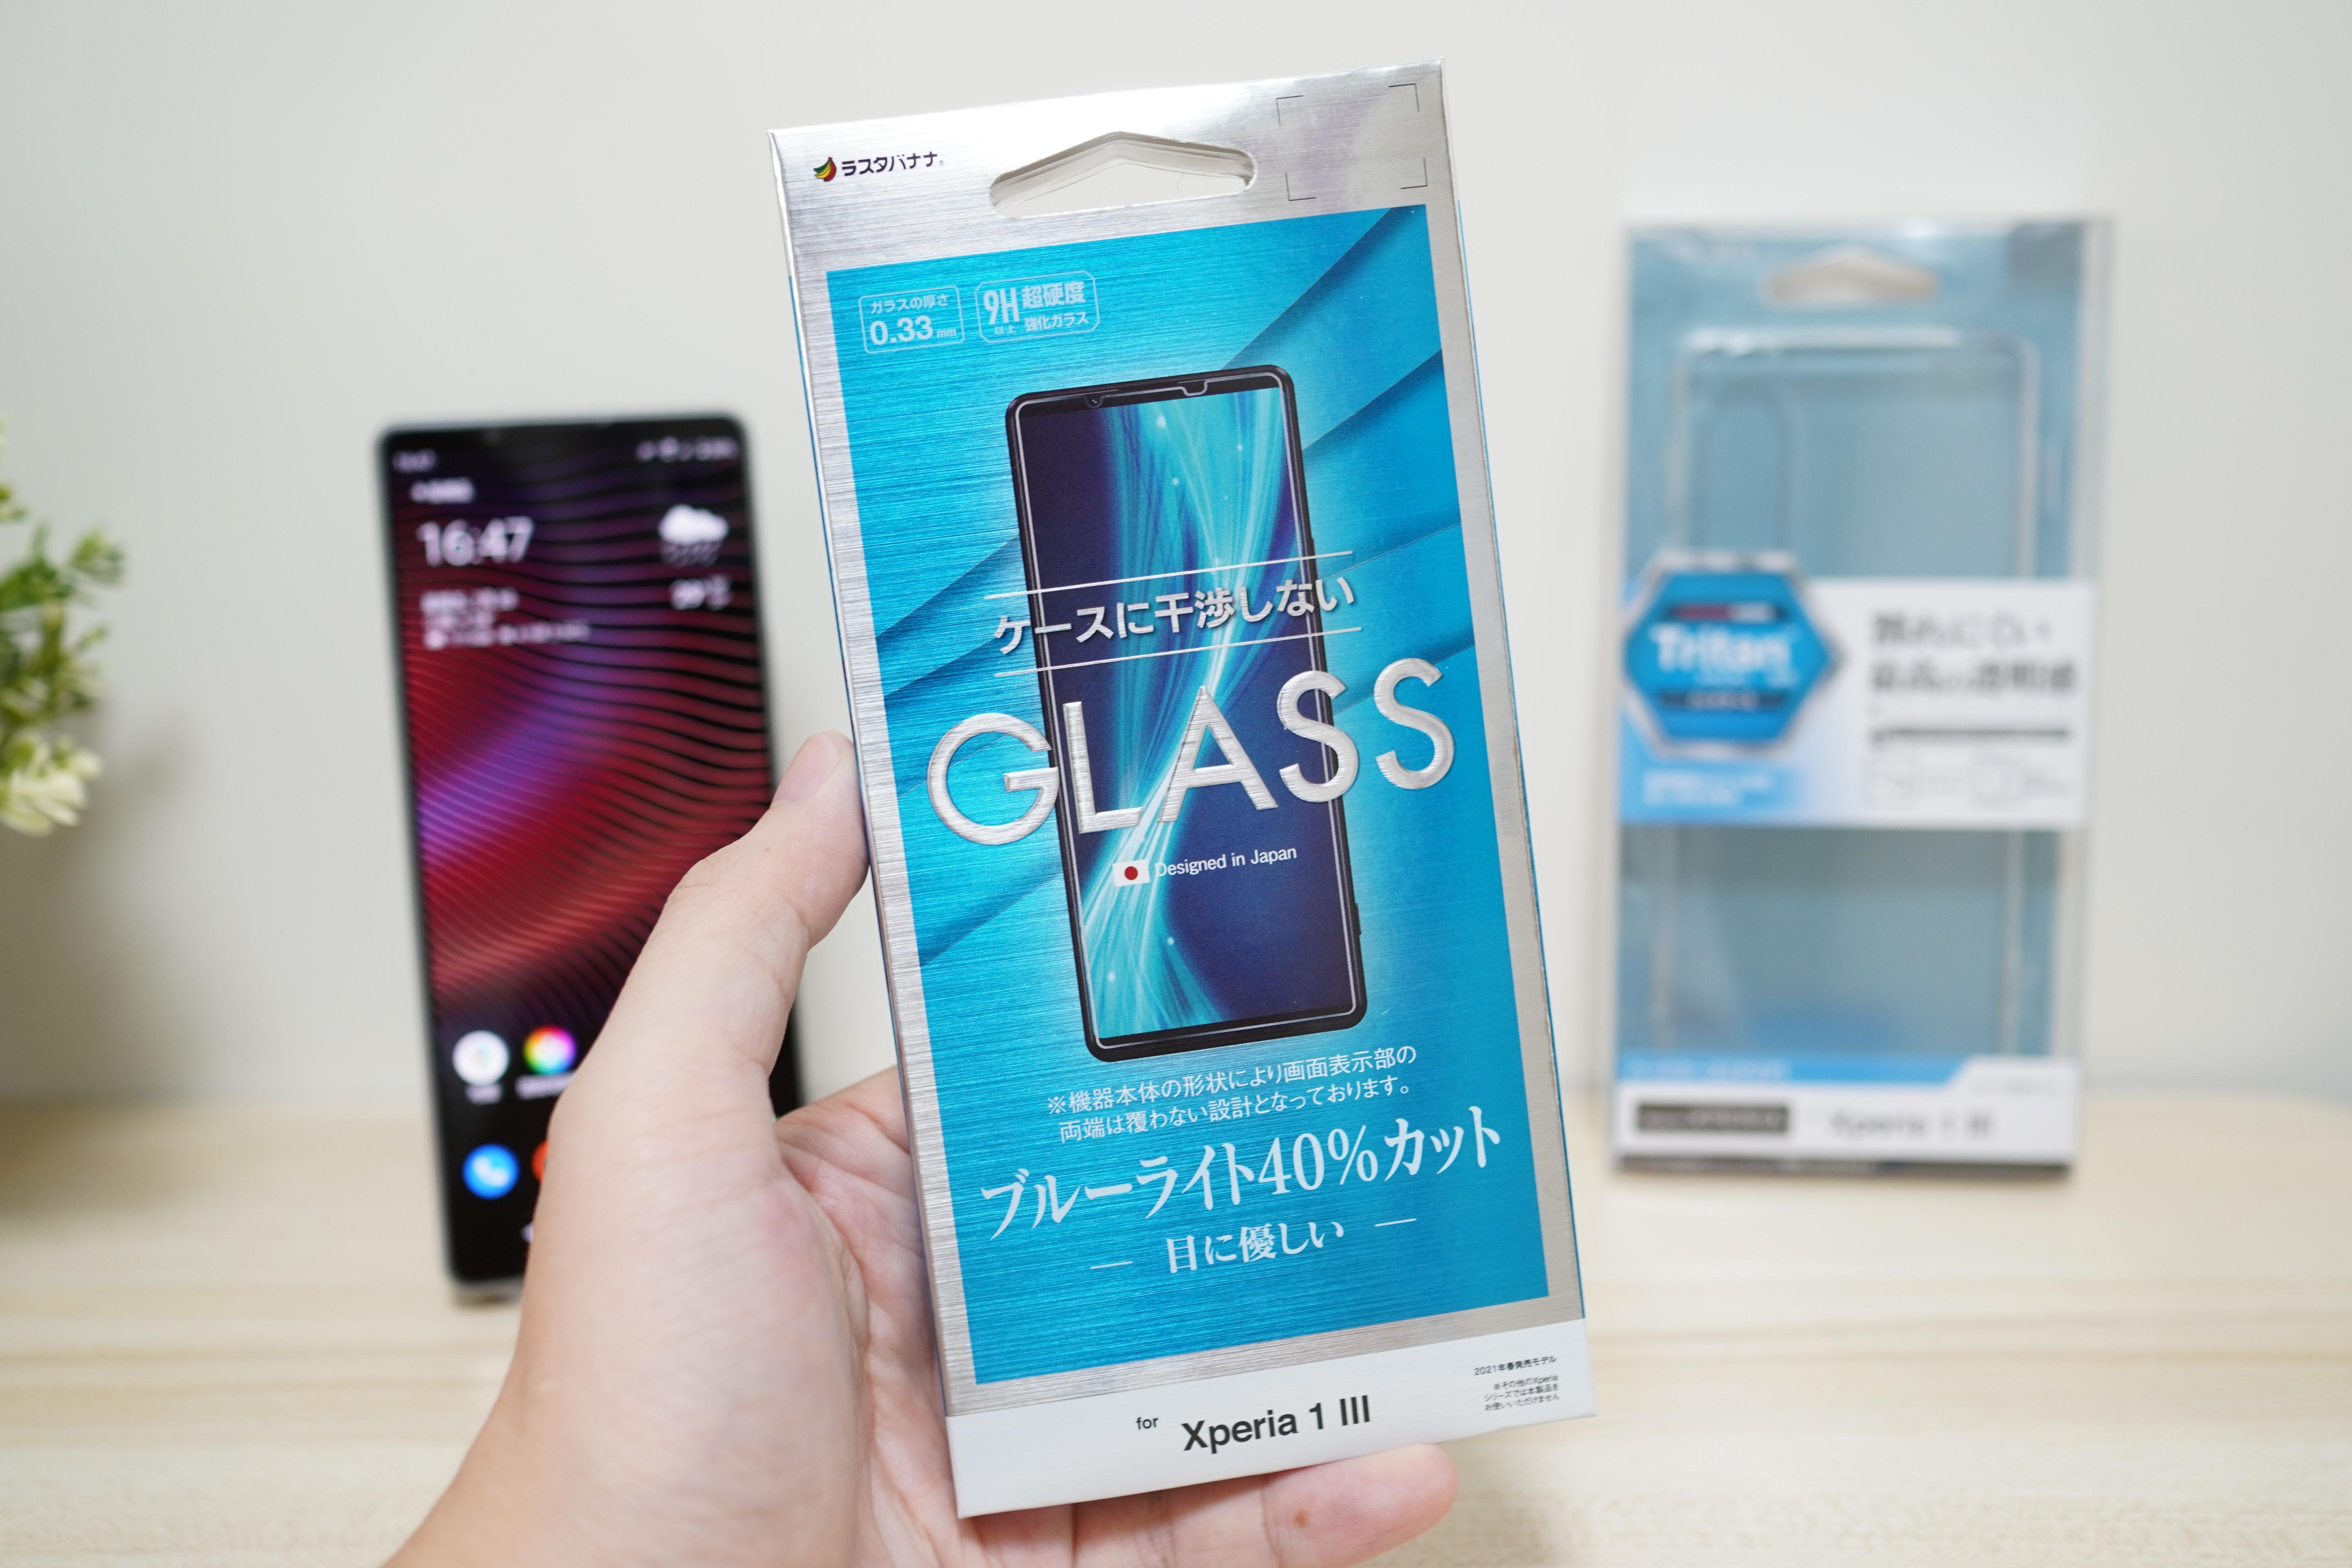 Made for Xperia 認證配件RASTA BANANA 高透明保護殼、濾藍光玻璃保護貼,Xperia 1 III配件分享